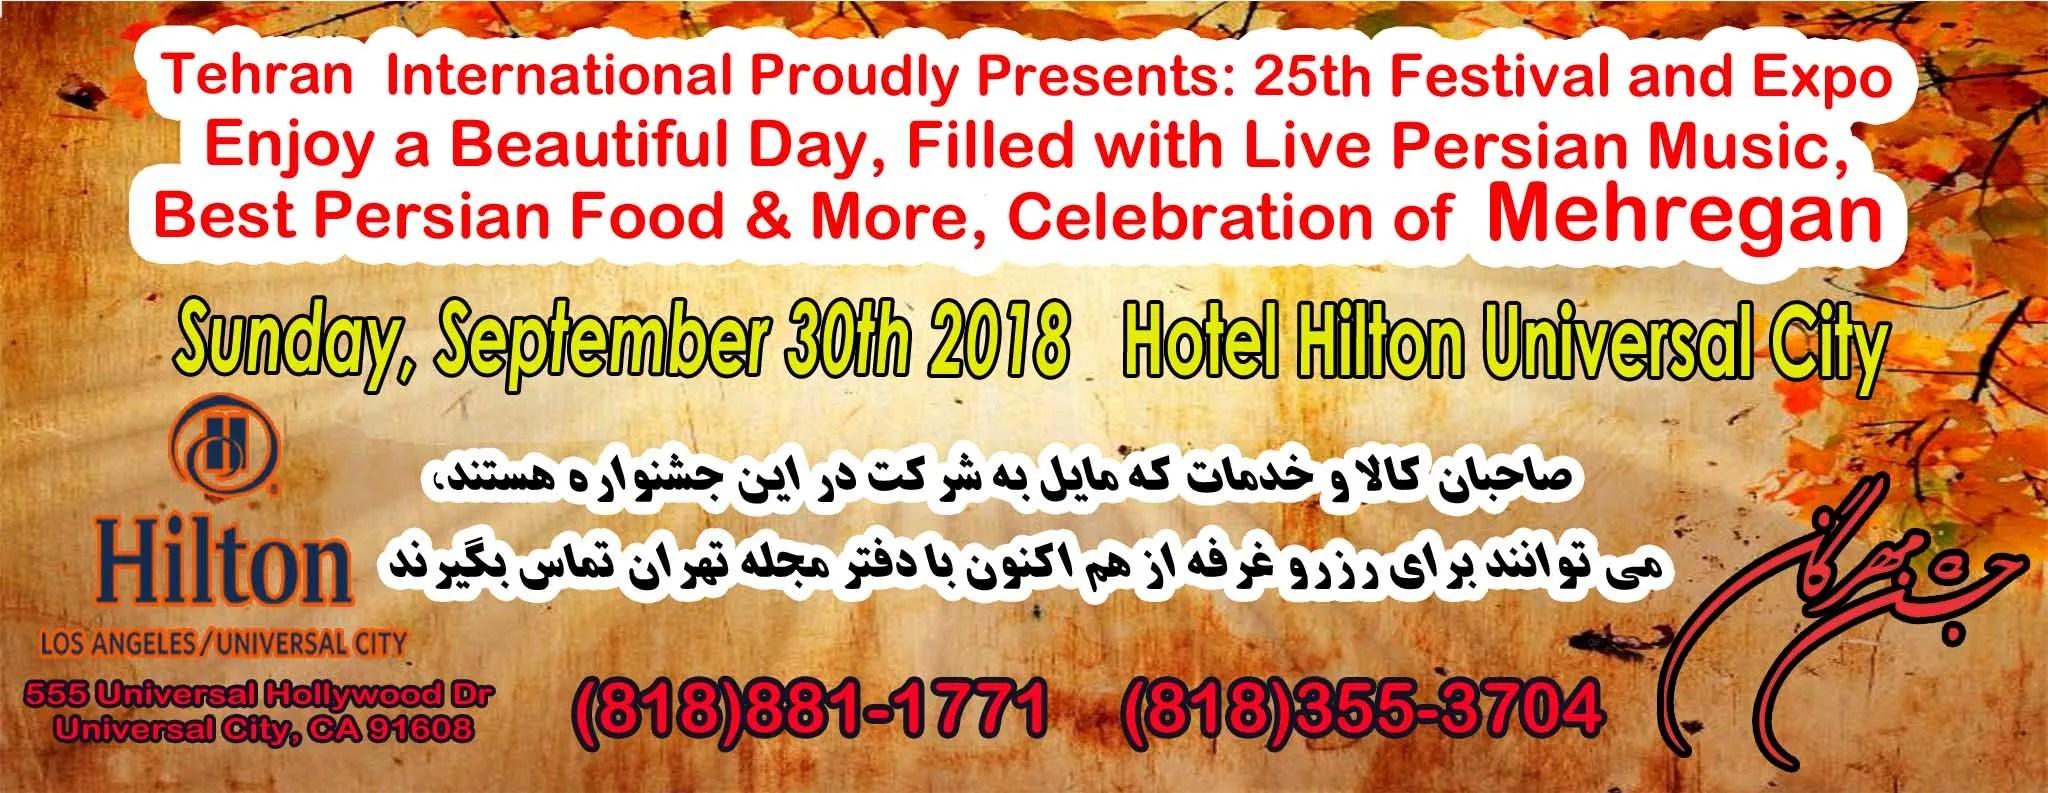 tehran-magazine-festiva-expo-mehregan-shahbod-noori